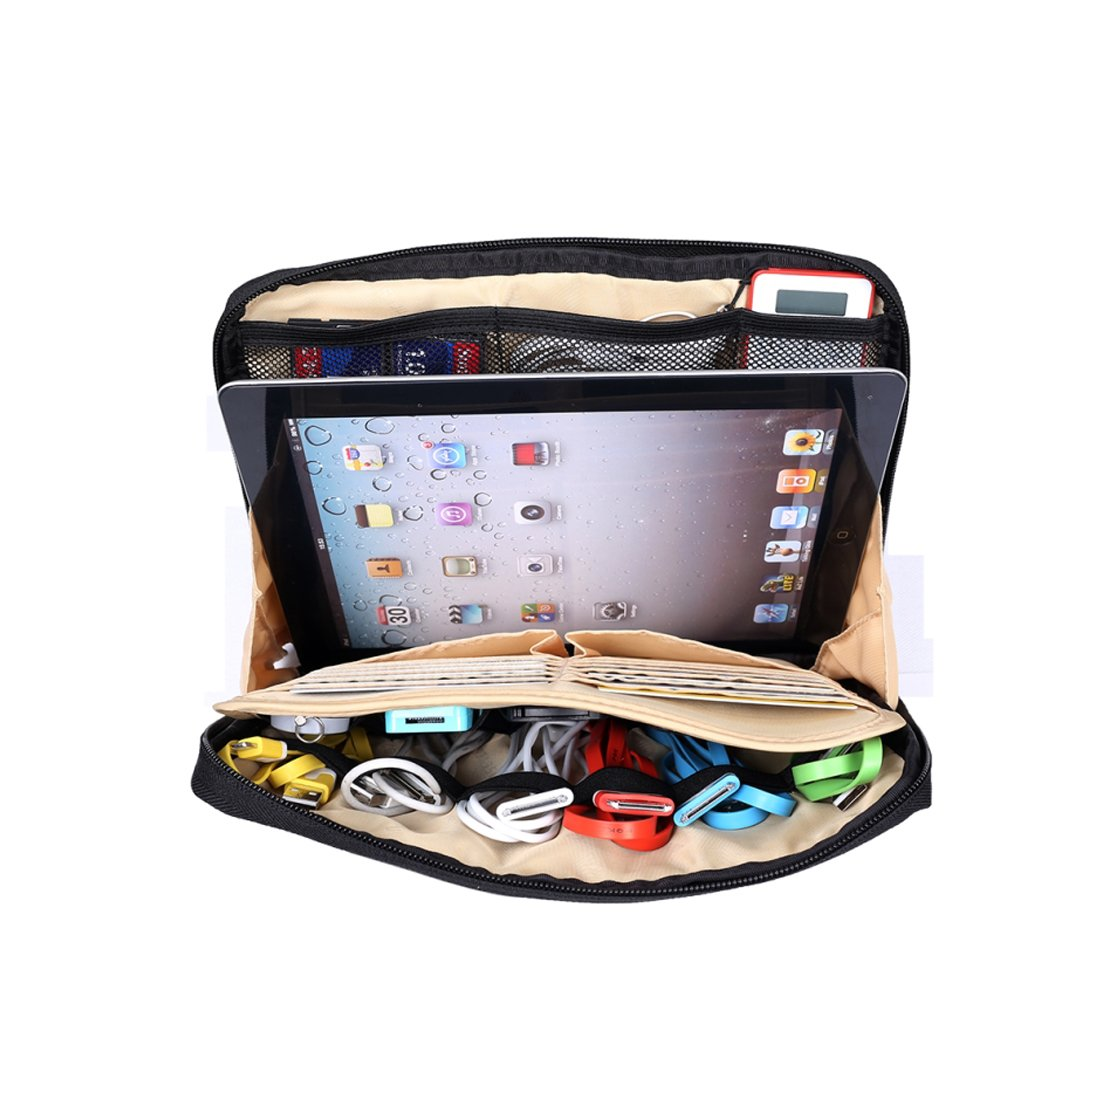 Amazon.com: BUBM Portable Universal Electronics Accessories Travel ...